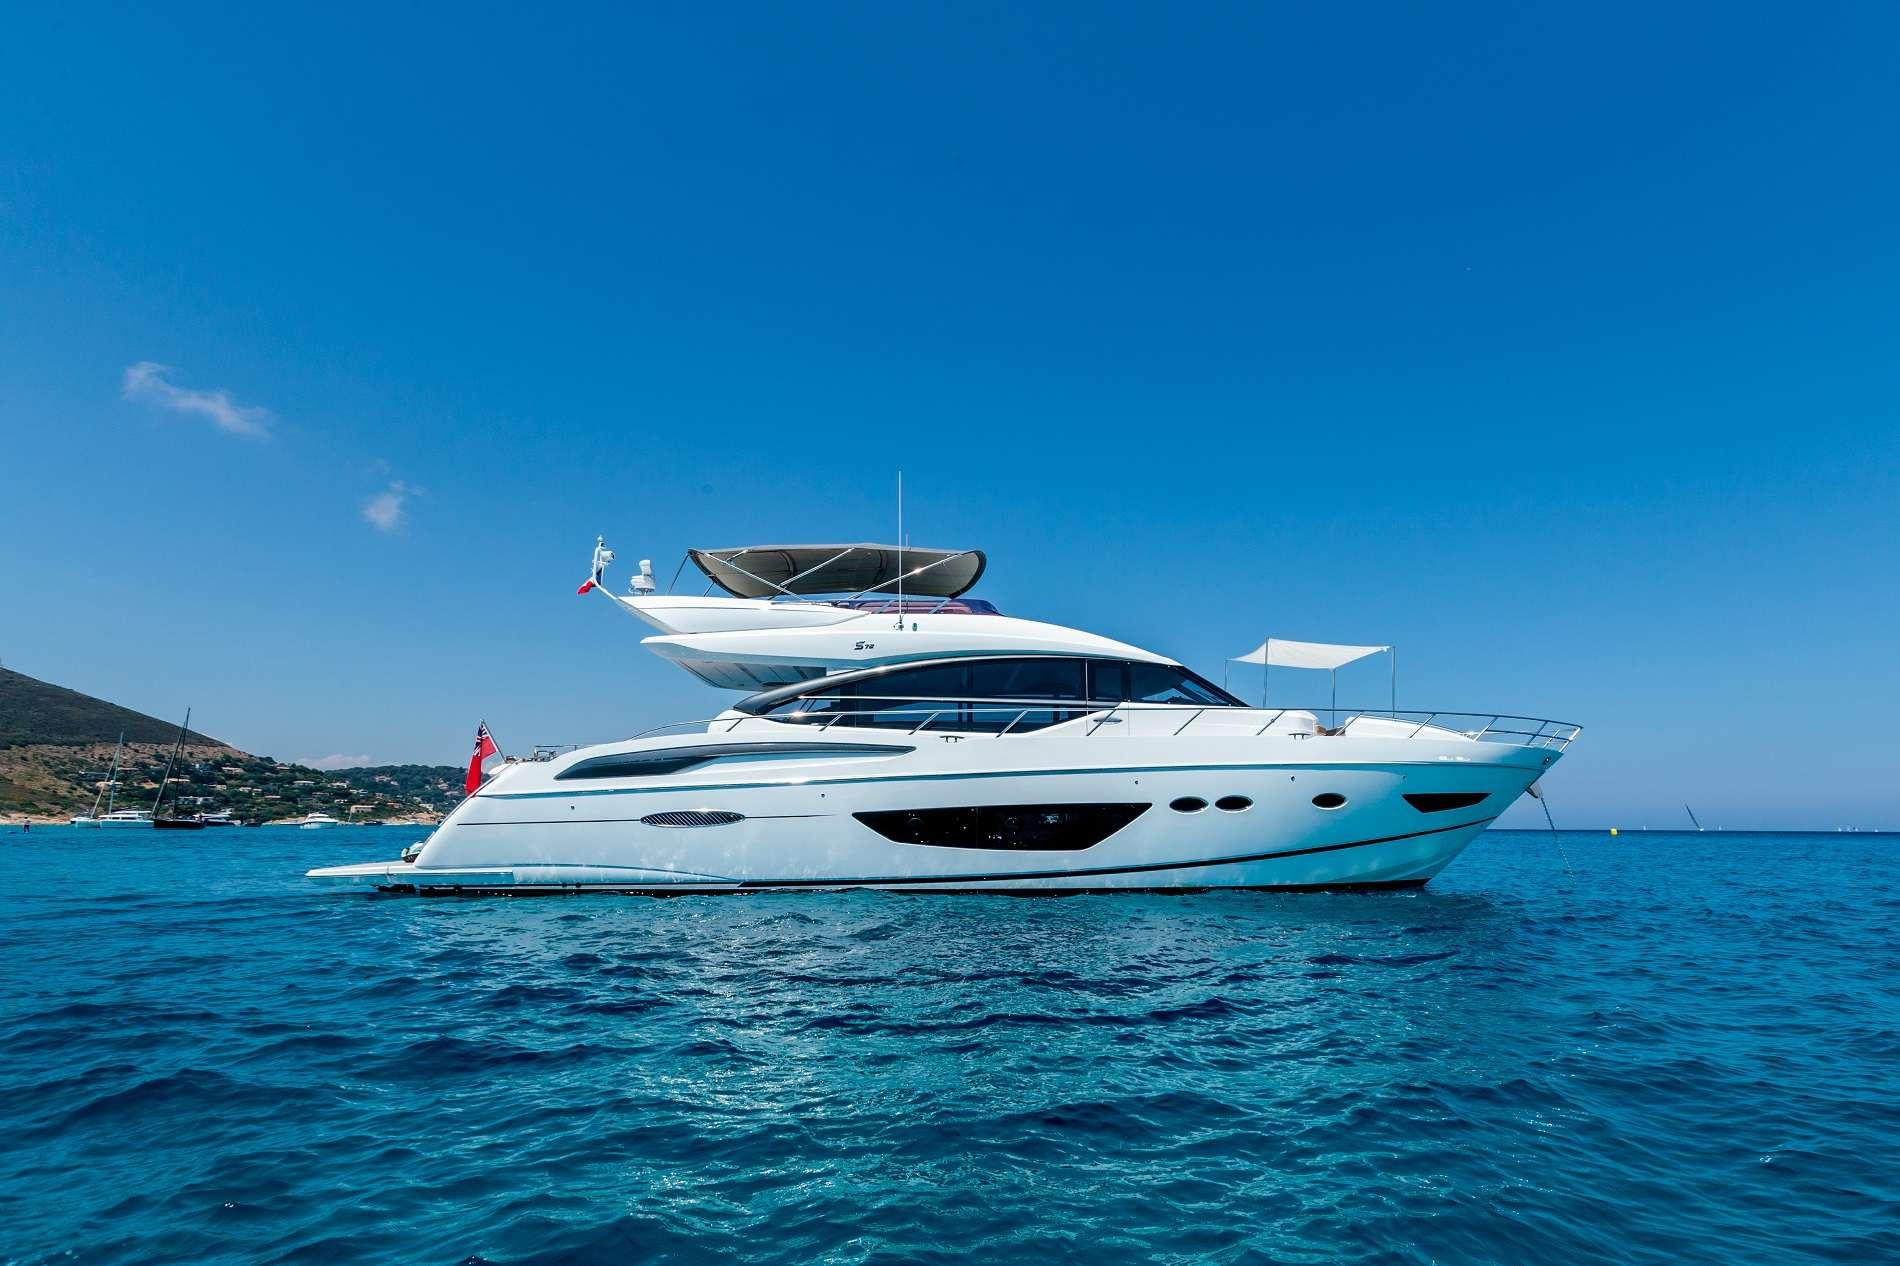 Main image of NELENA yacht